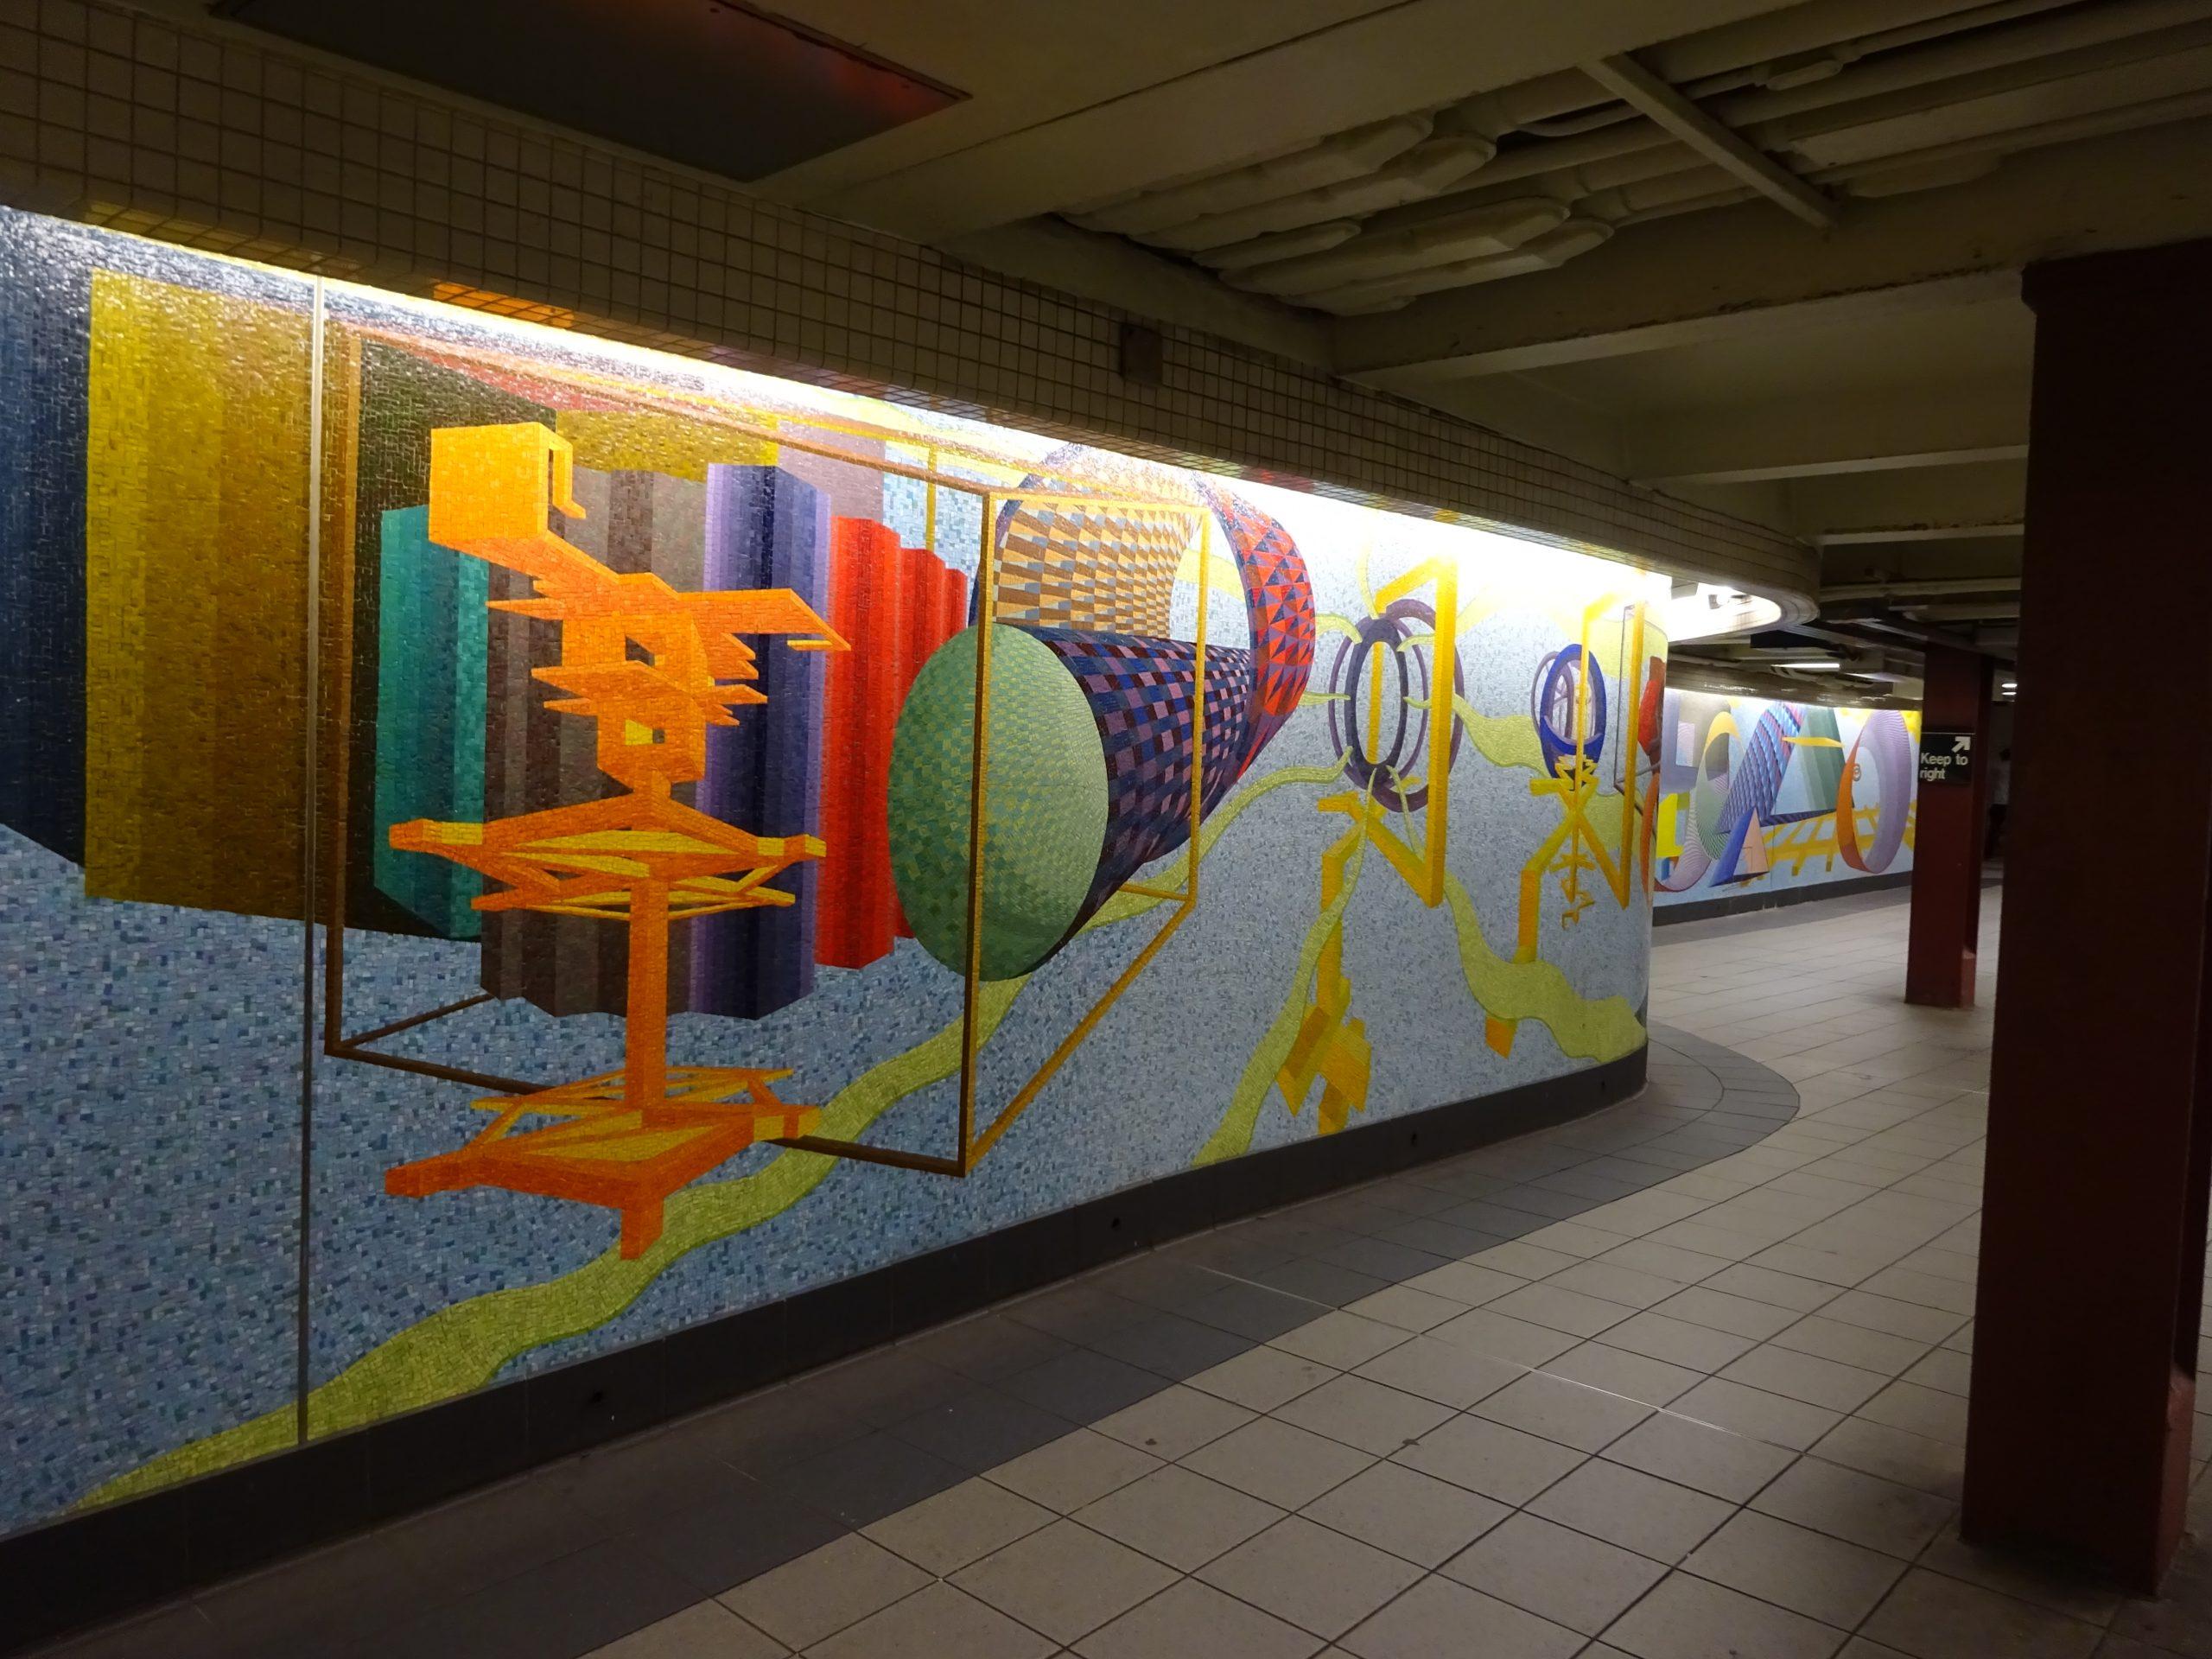 Metrostation, New York (2017)